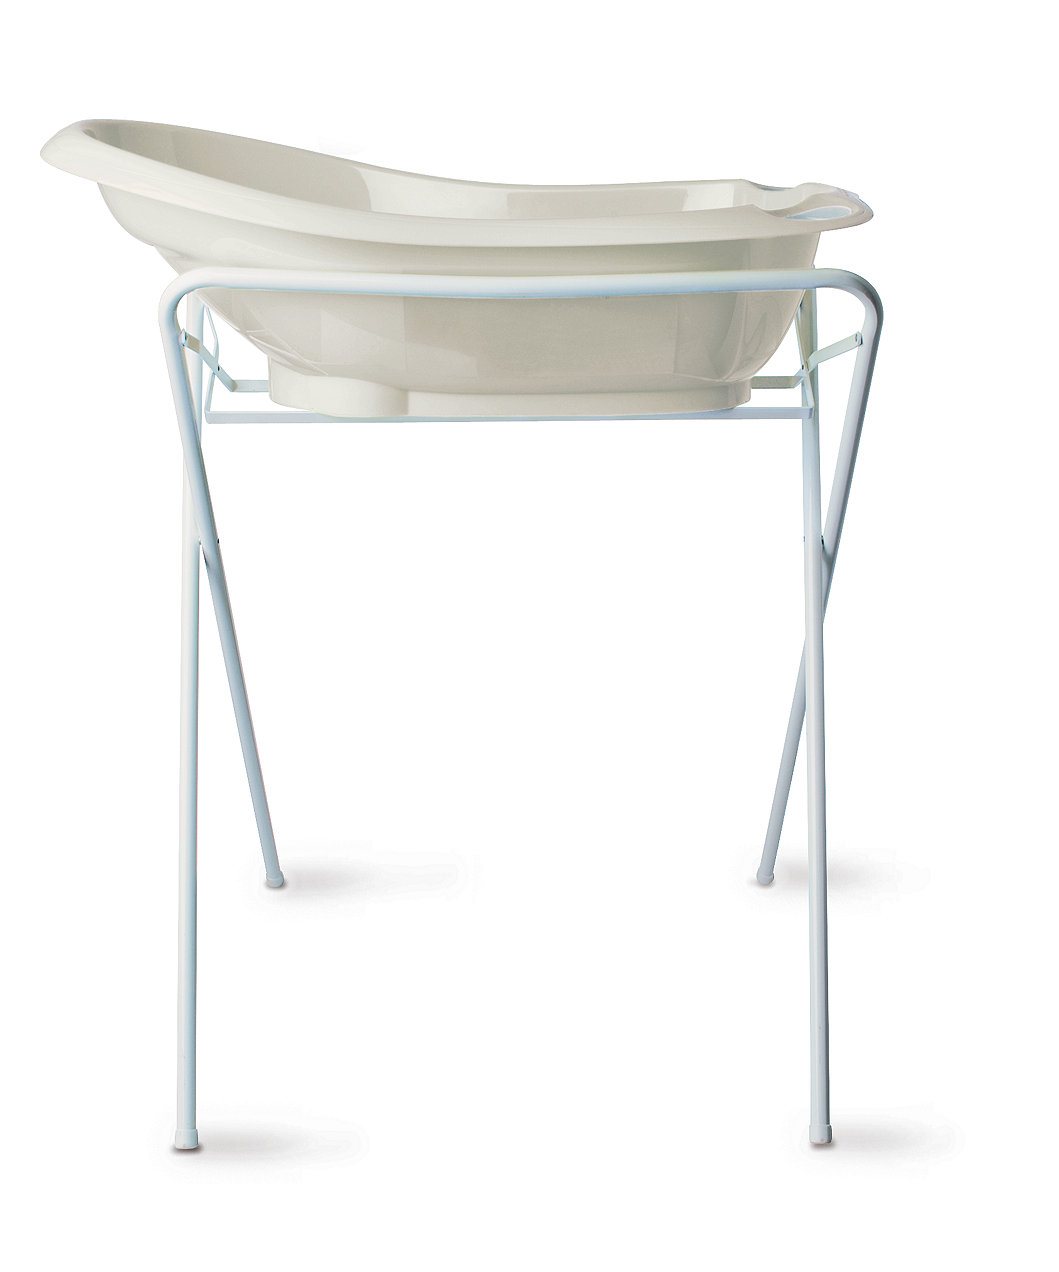 Baby Bath Tub With Stand.50 Great Baby Bath Tub Stand Ikea Baby Bath